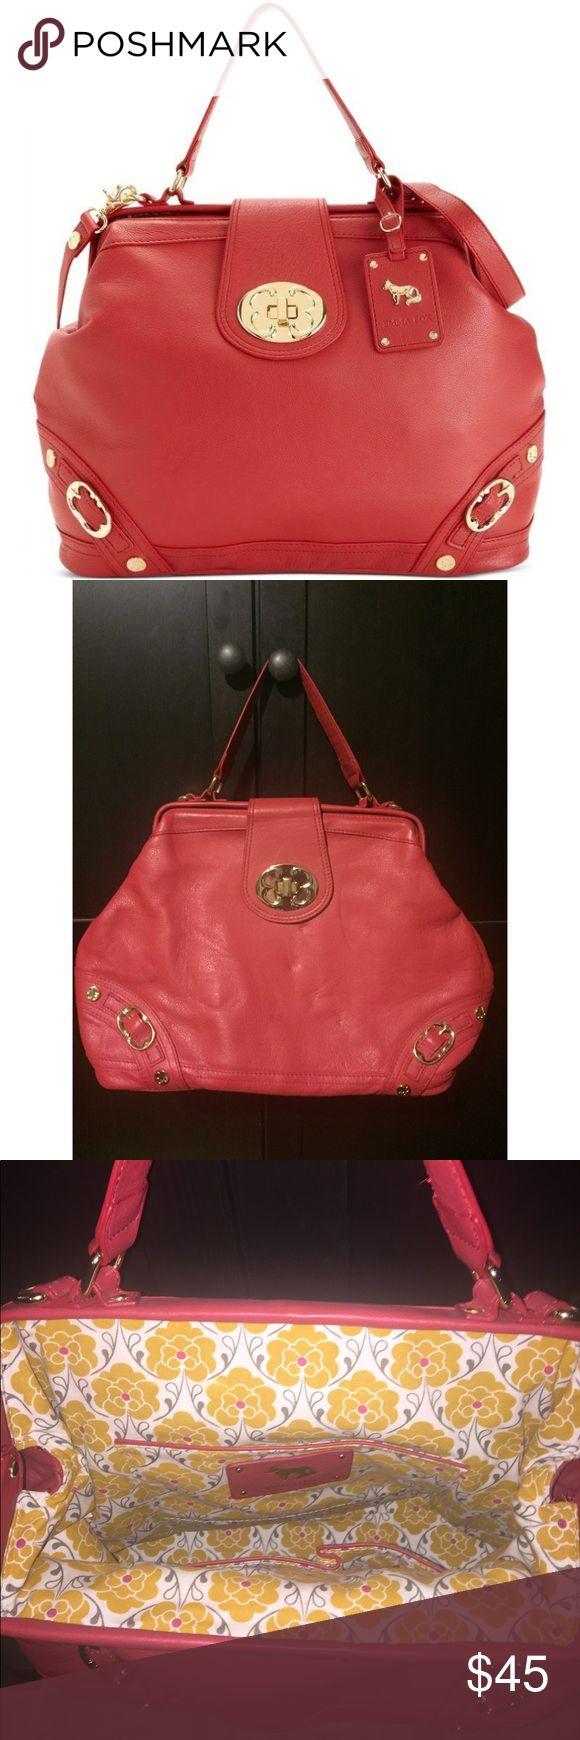 Emma Fox Red Leather Handbag NWOT Emma Fox red leather handbag! Feel free to make me an offer :) Emma Fox Bags Shoulder Bags